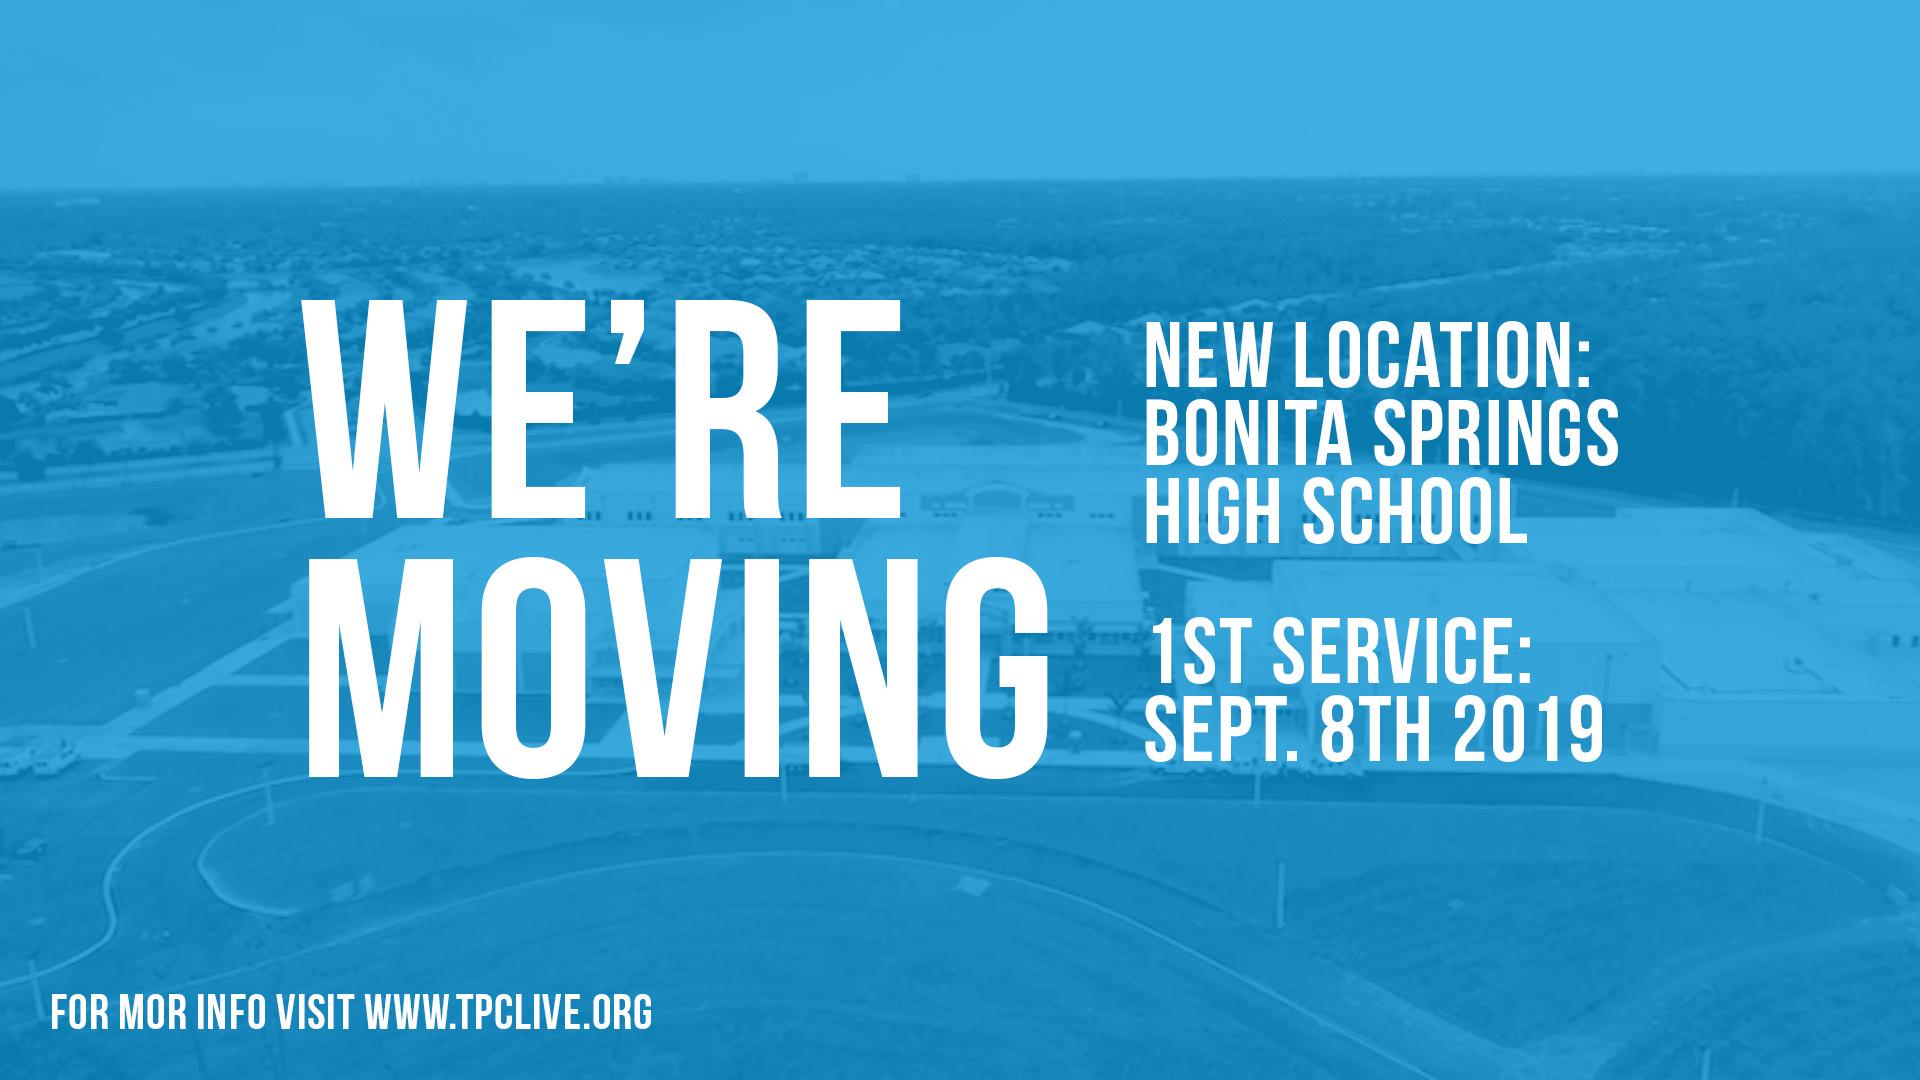 We're Moving info.jpg